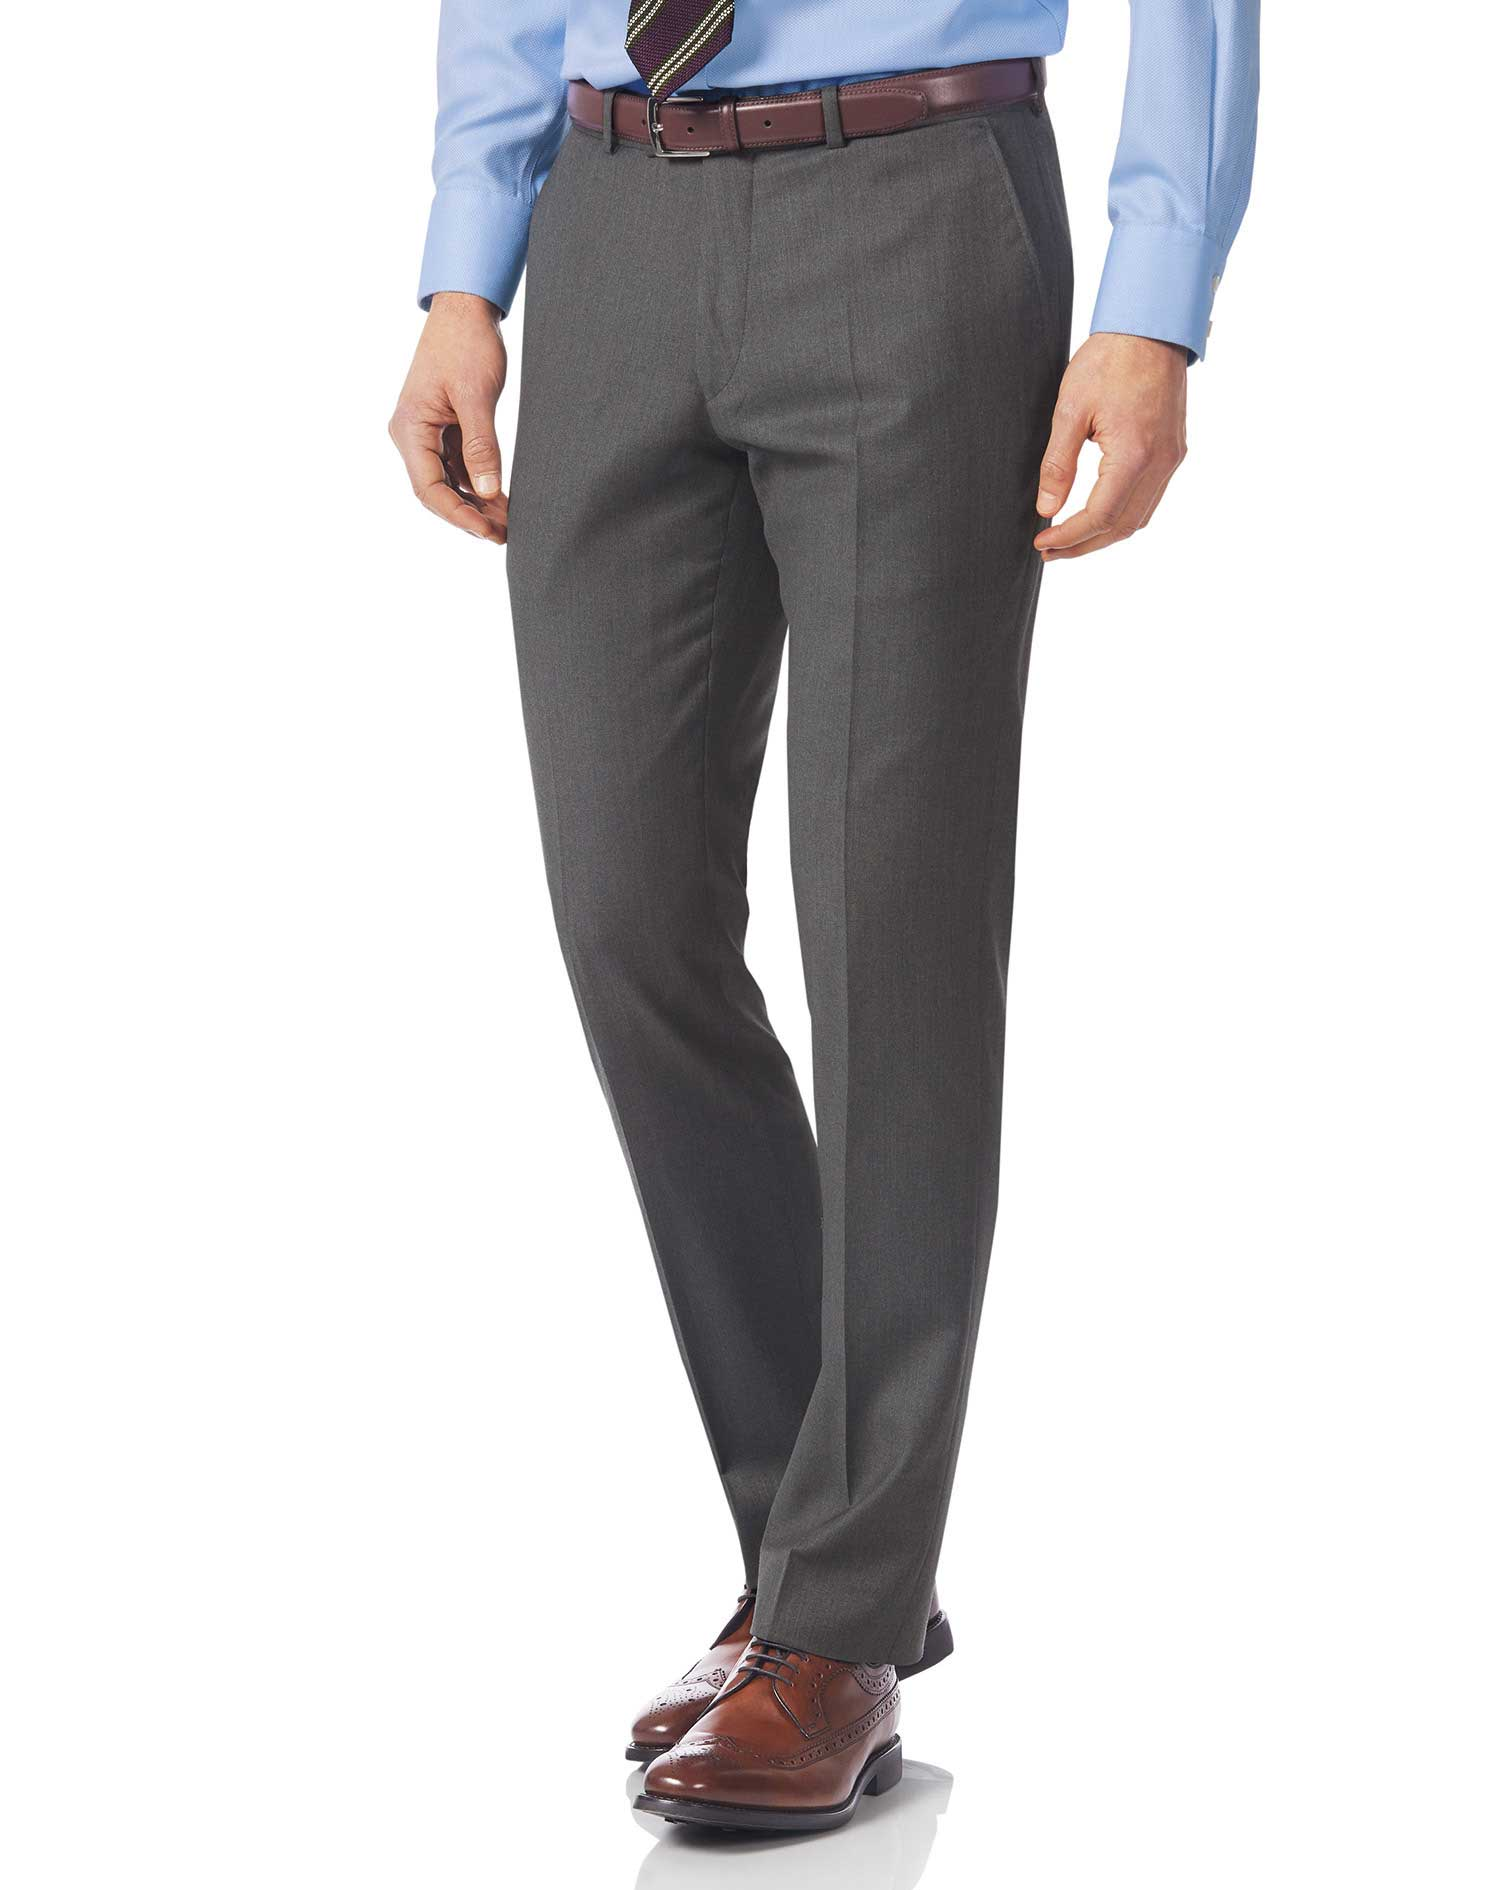 Grey Slim Fit Italian Twill Luxury Suit Trousers Size W36 L30 by Charles Tyrwhitt